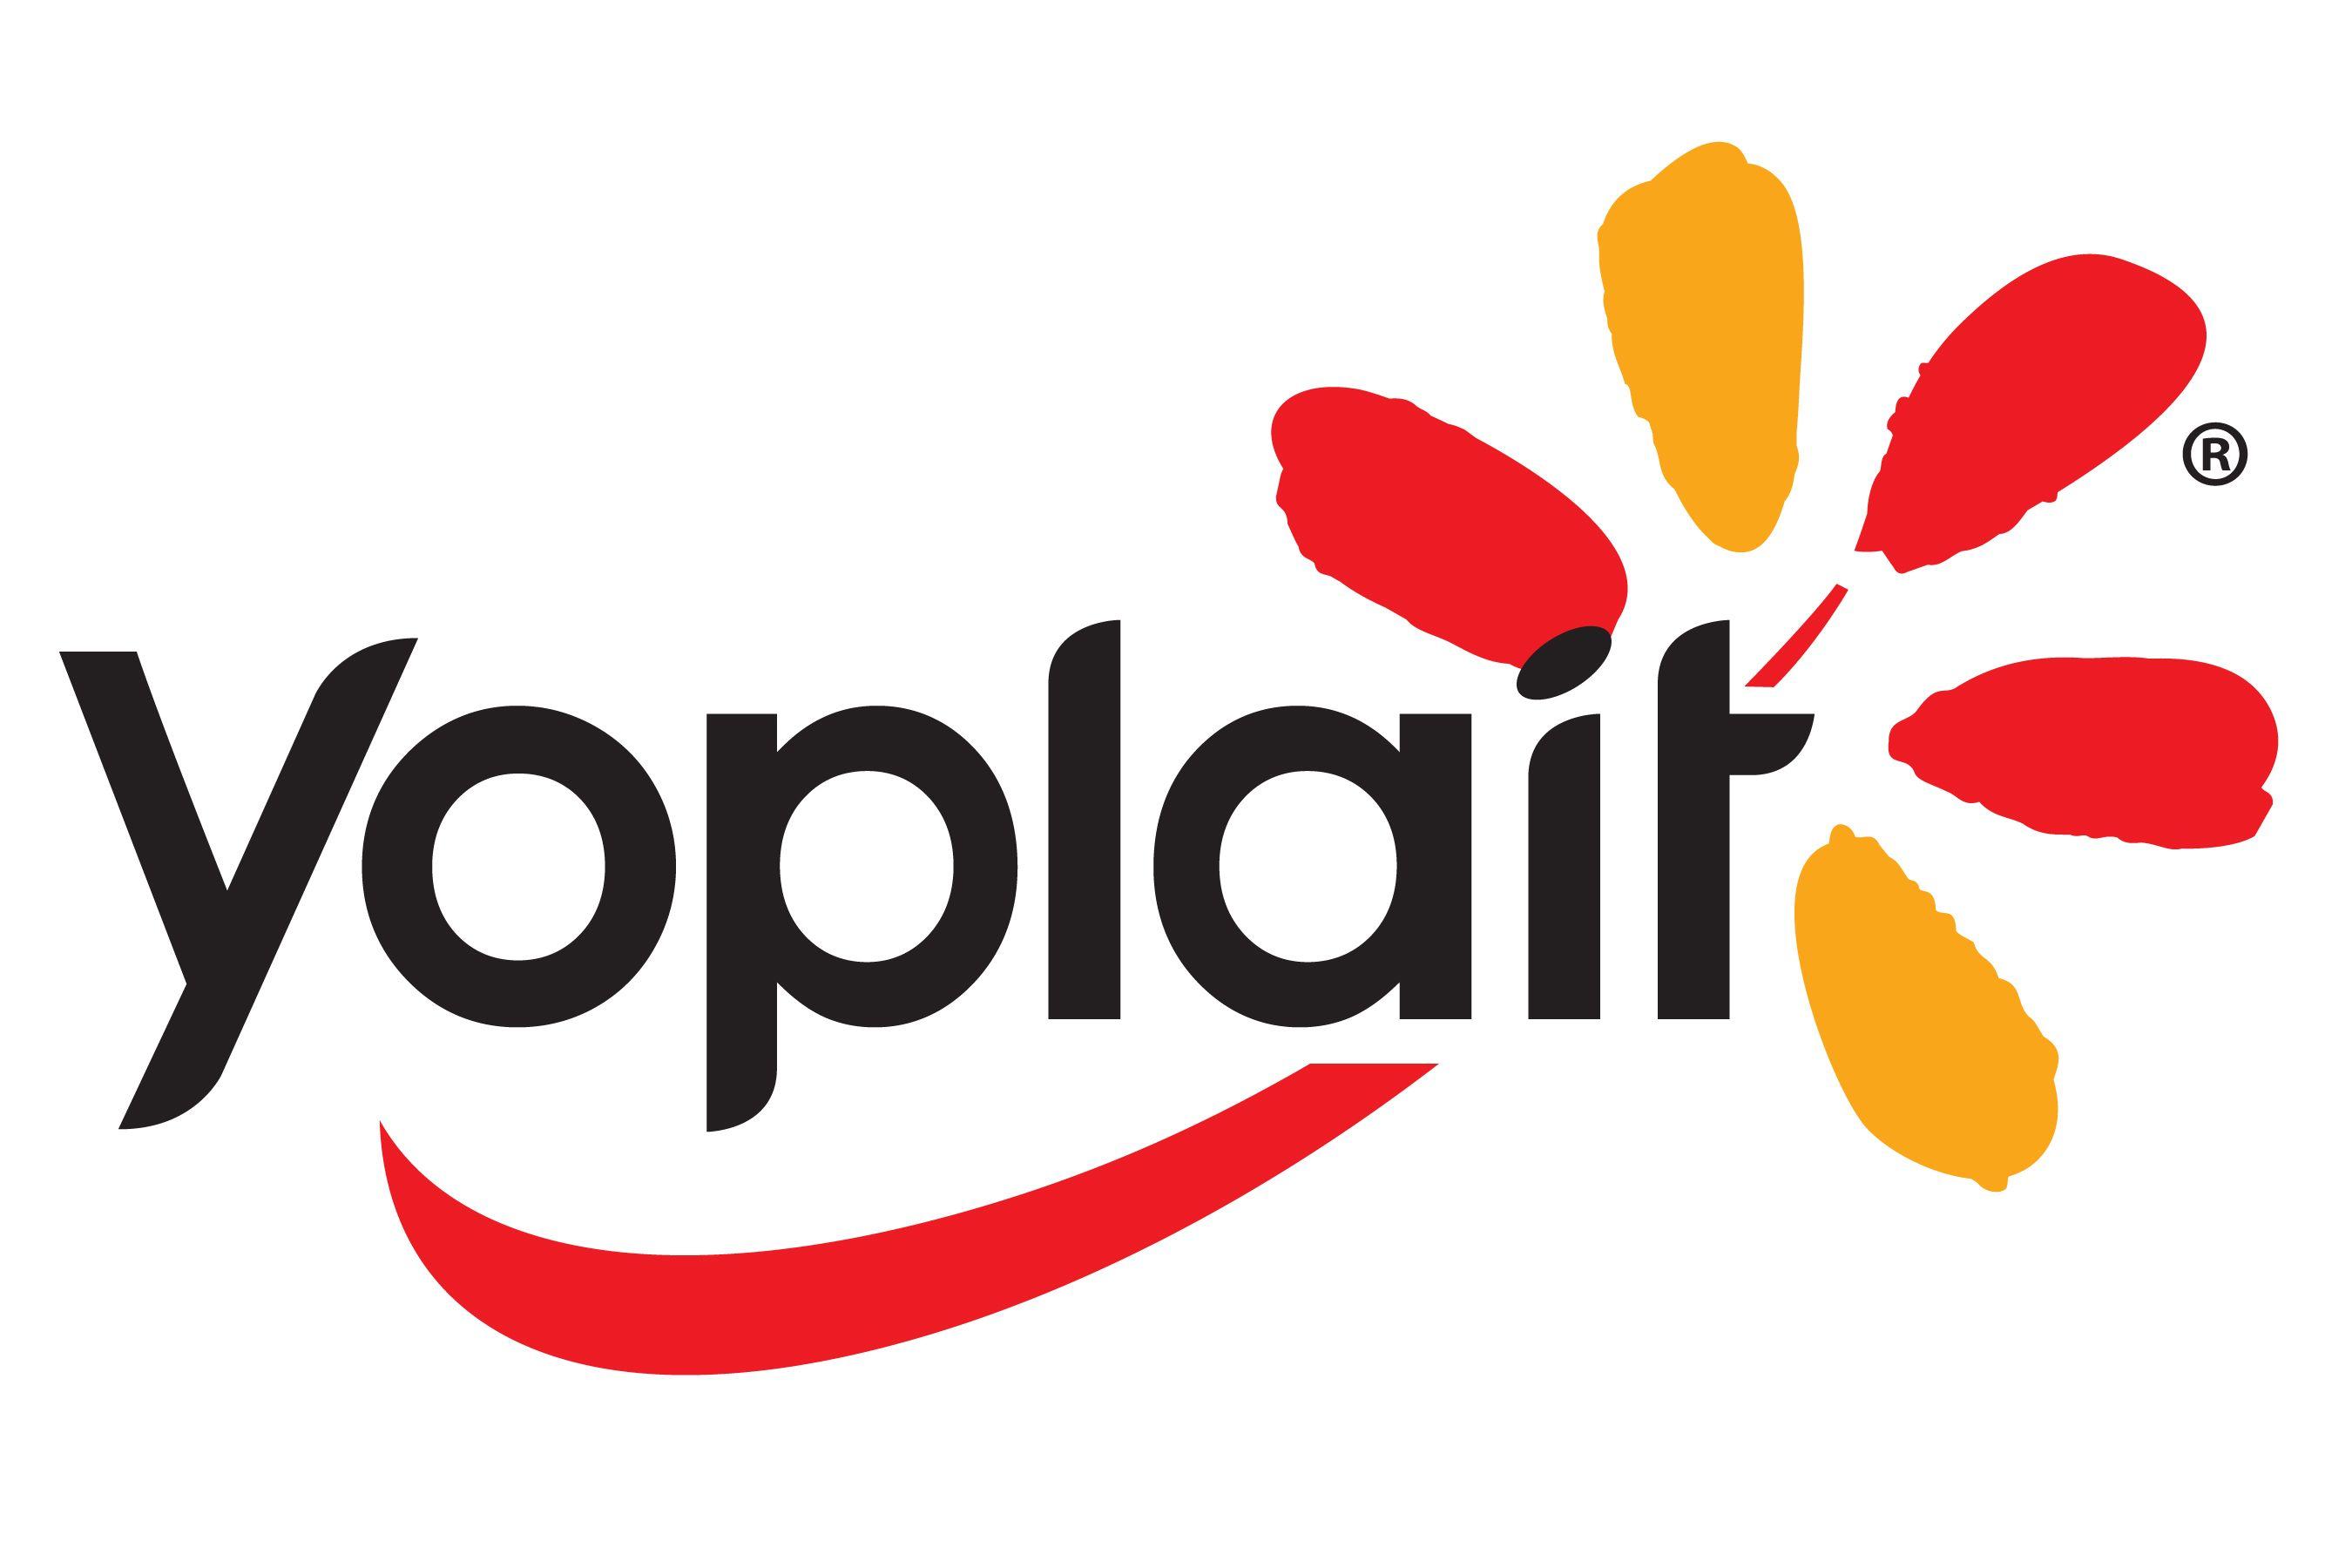 Yoplait Logo, HiResolution, very similar to another logo